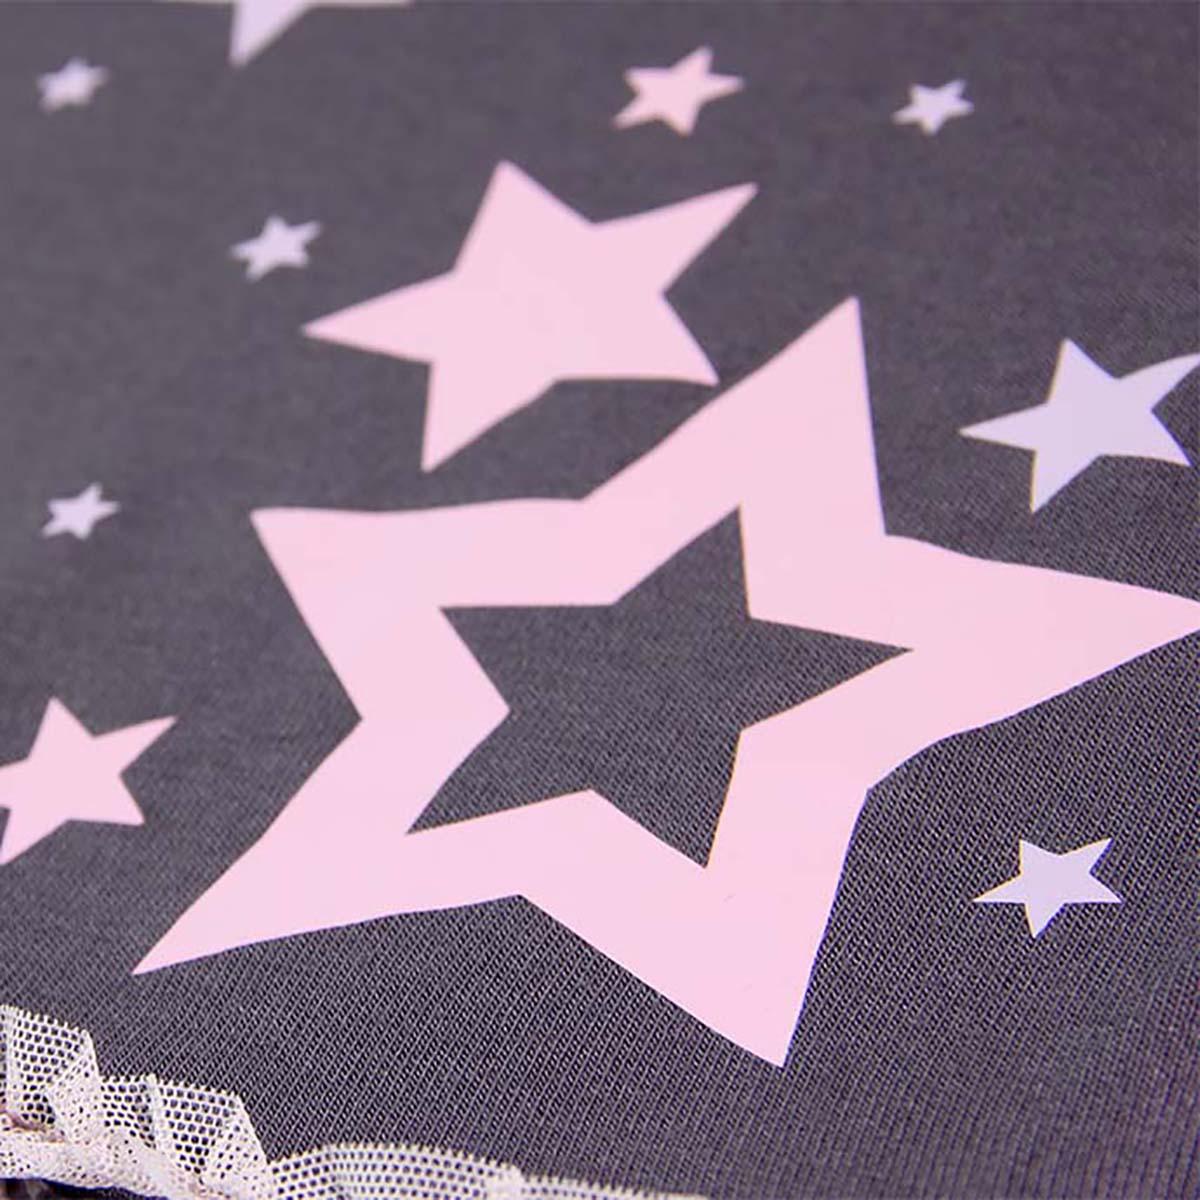 zvijezde twinkle sive tunike